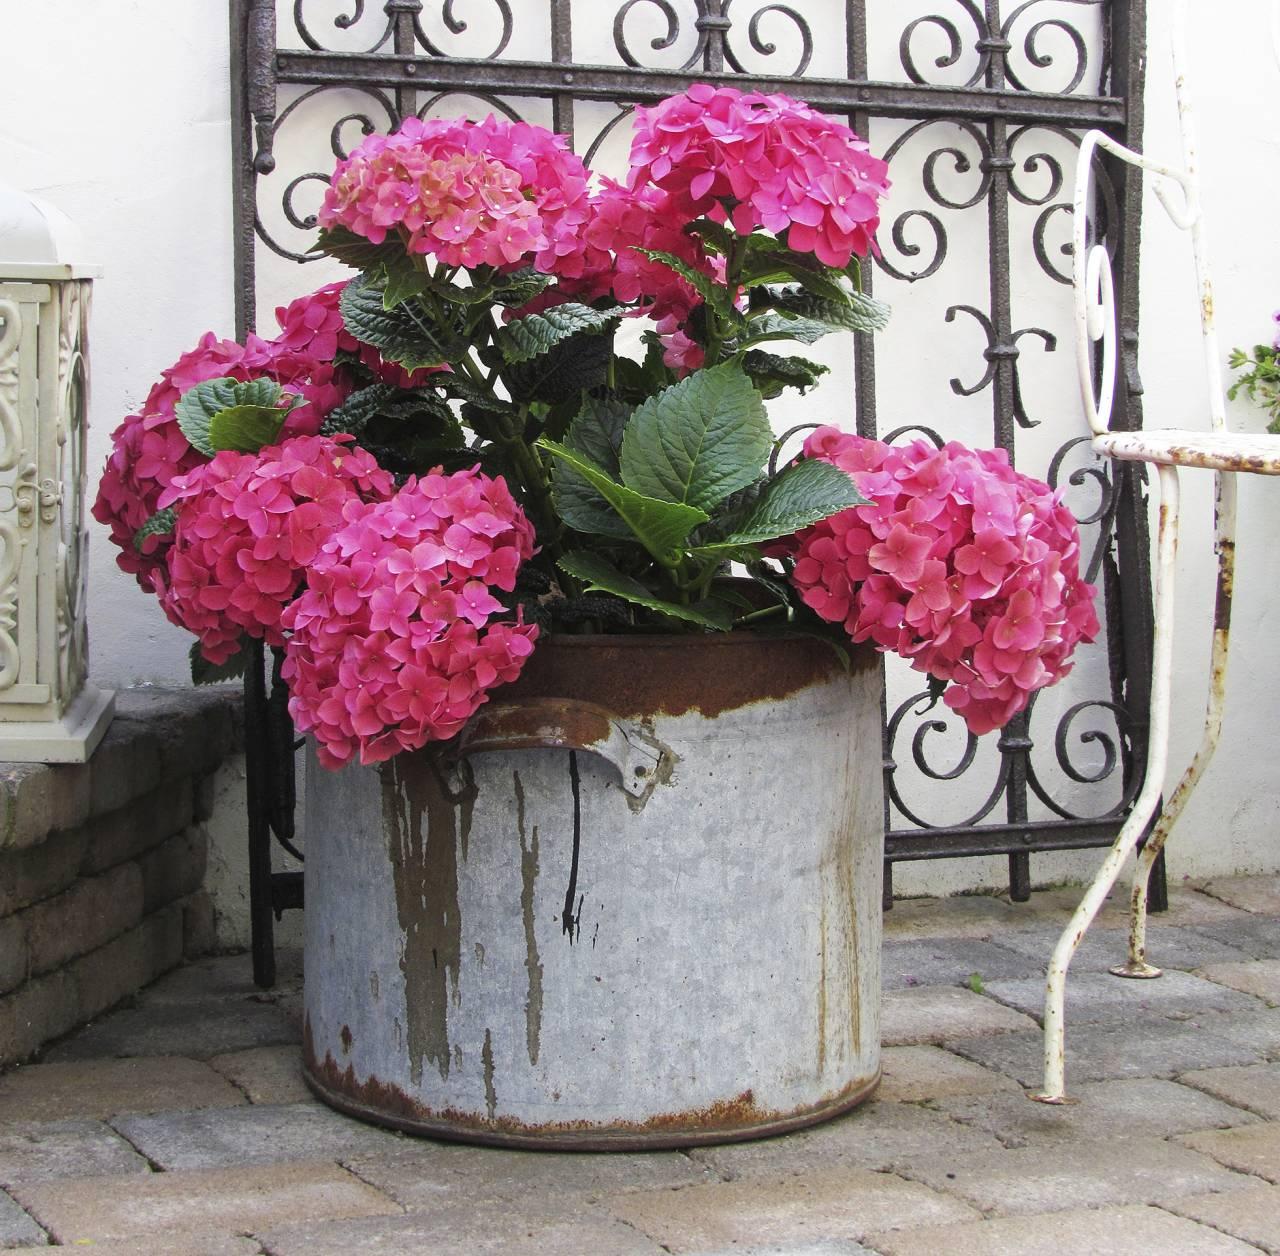 Rosa hortensia i utomhuskruka